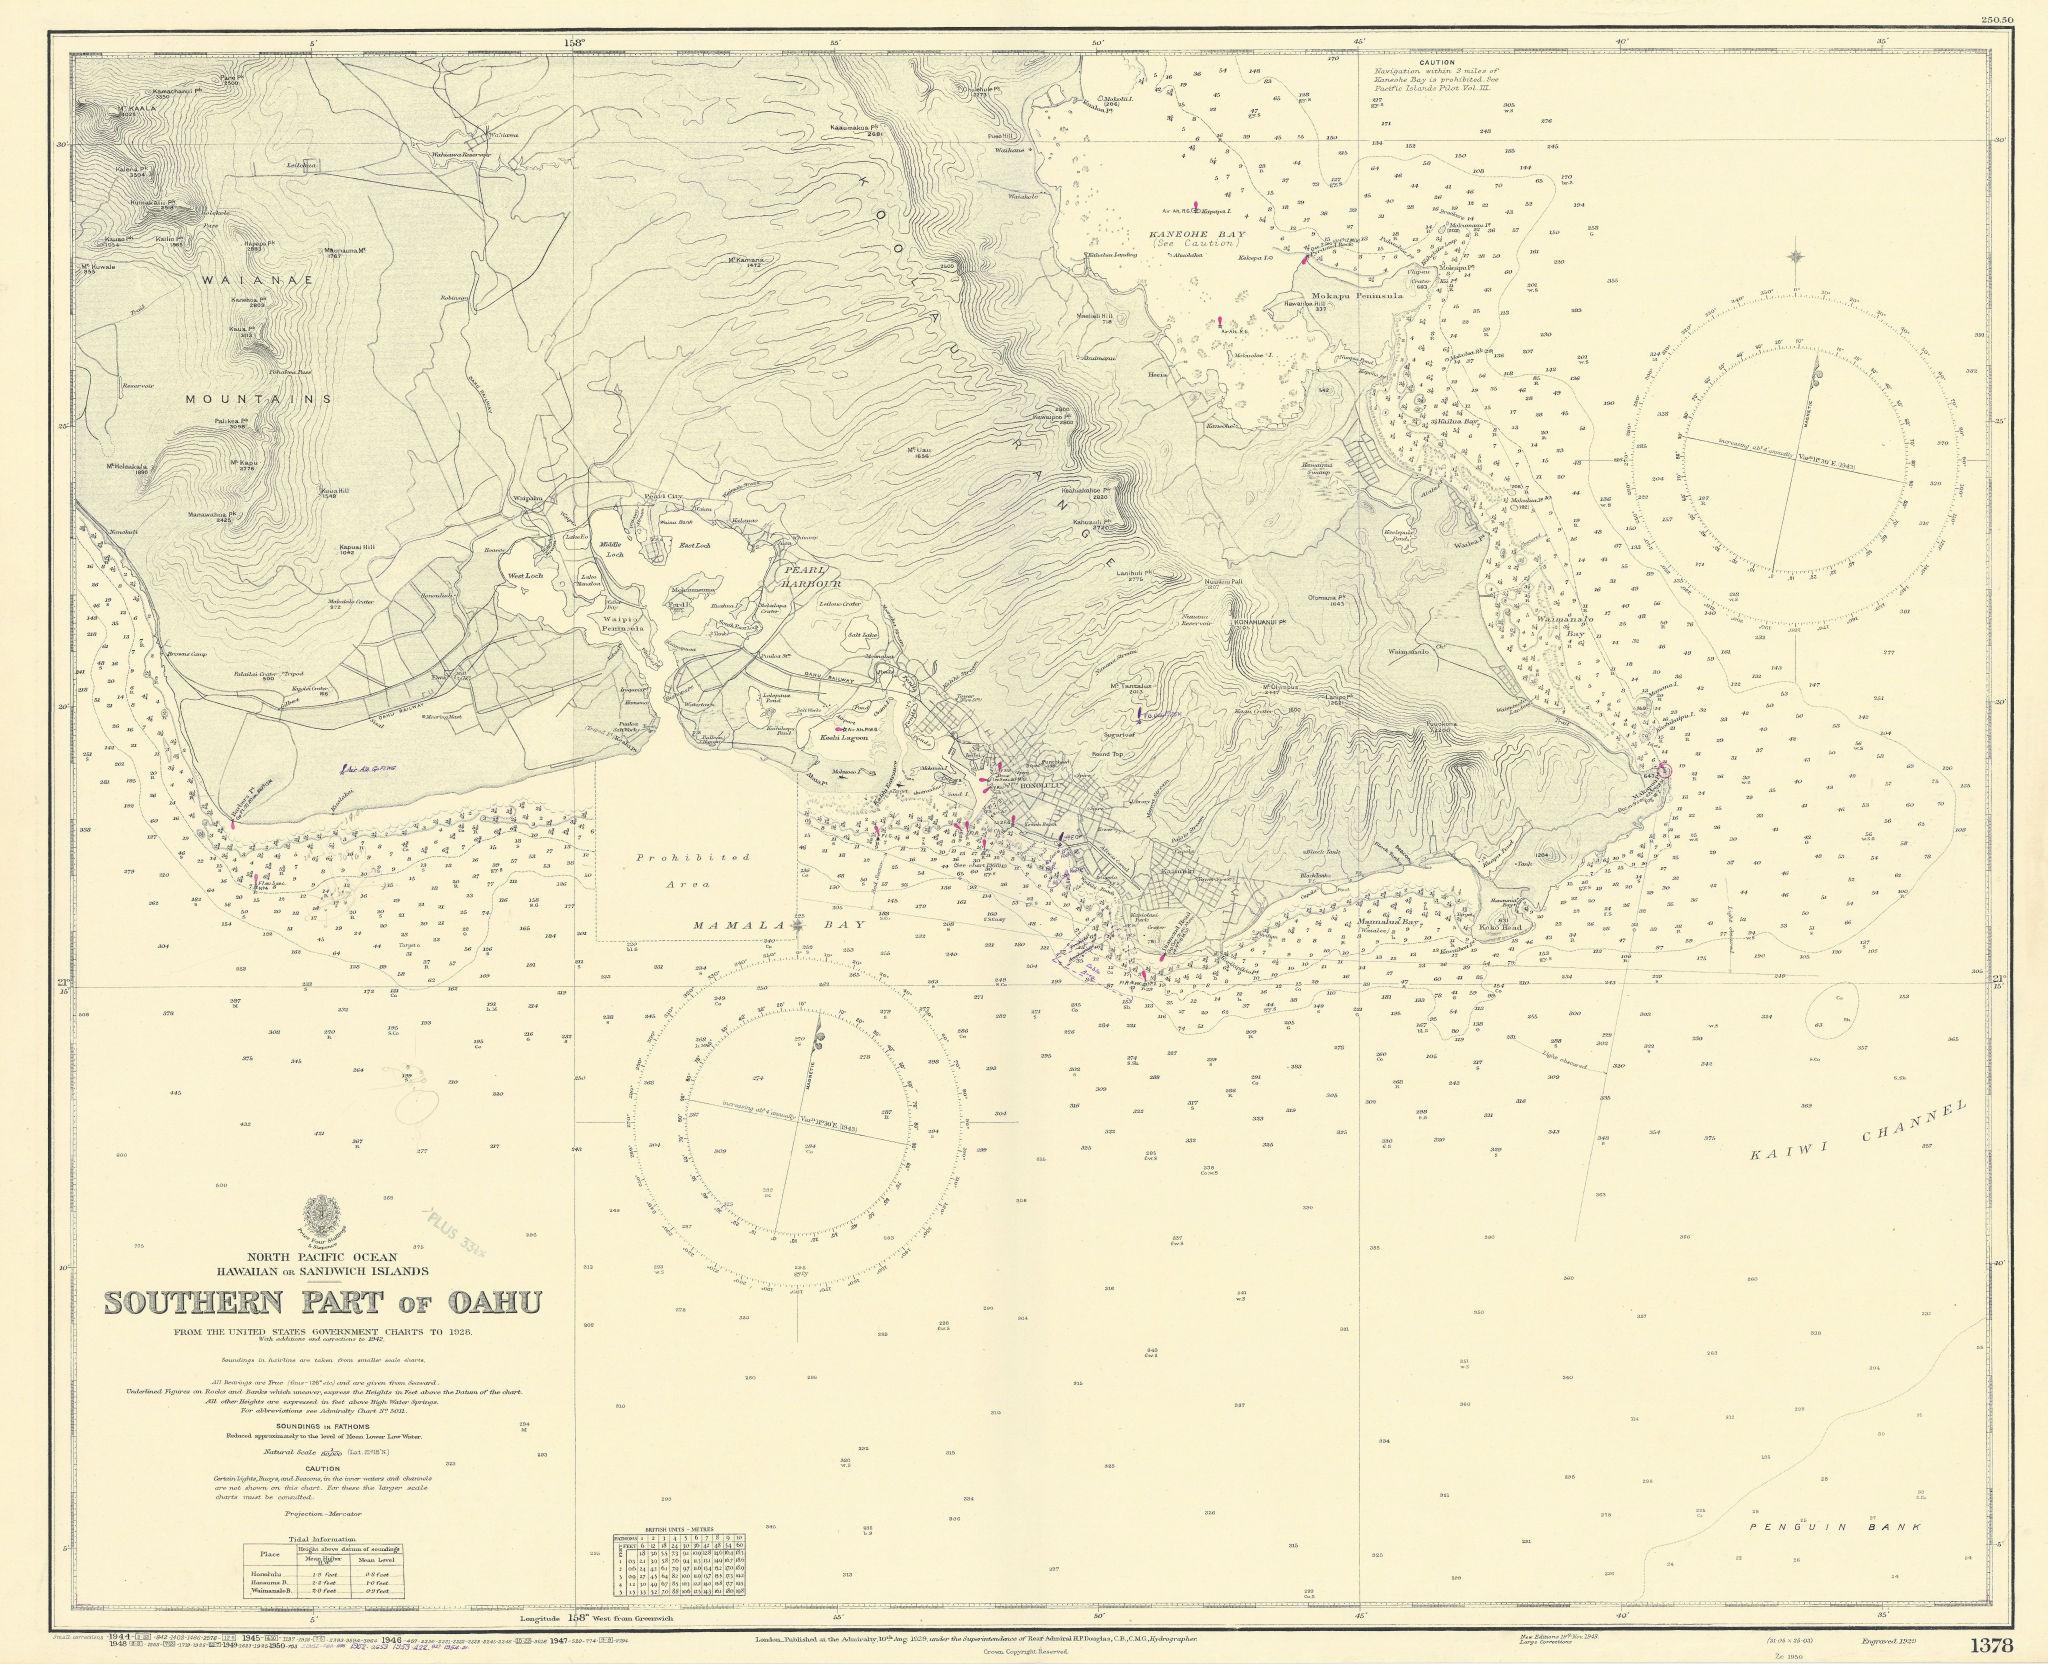 Southern Oahu. Hawaii. Pearl Harbor. ADMIRALTY sea chart 1929 (1954) old map